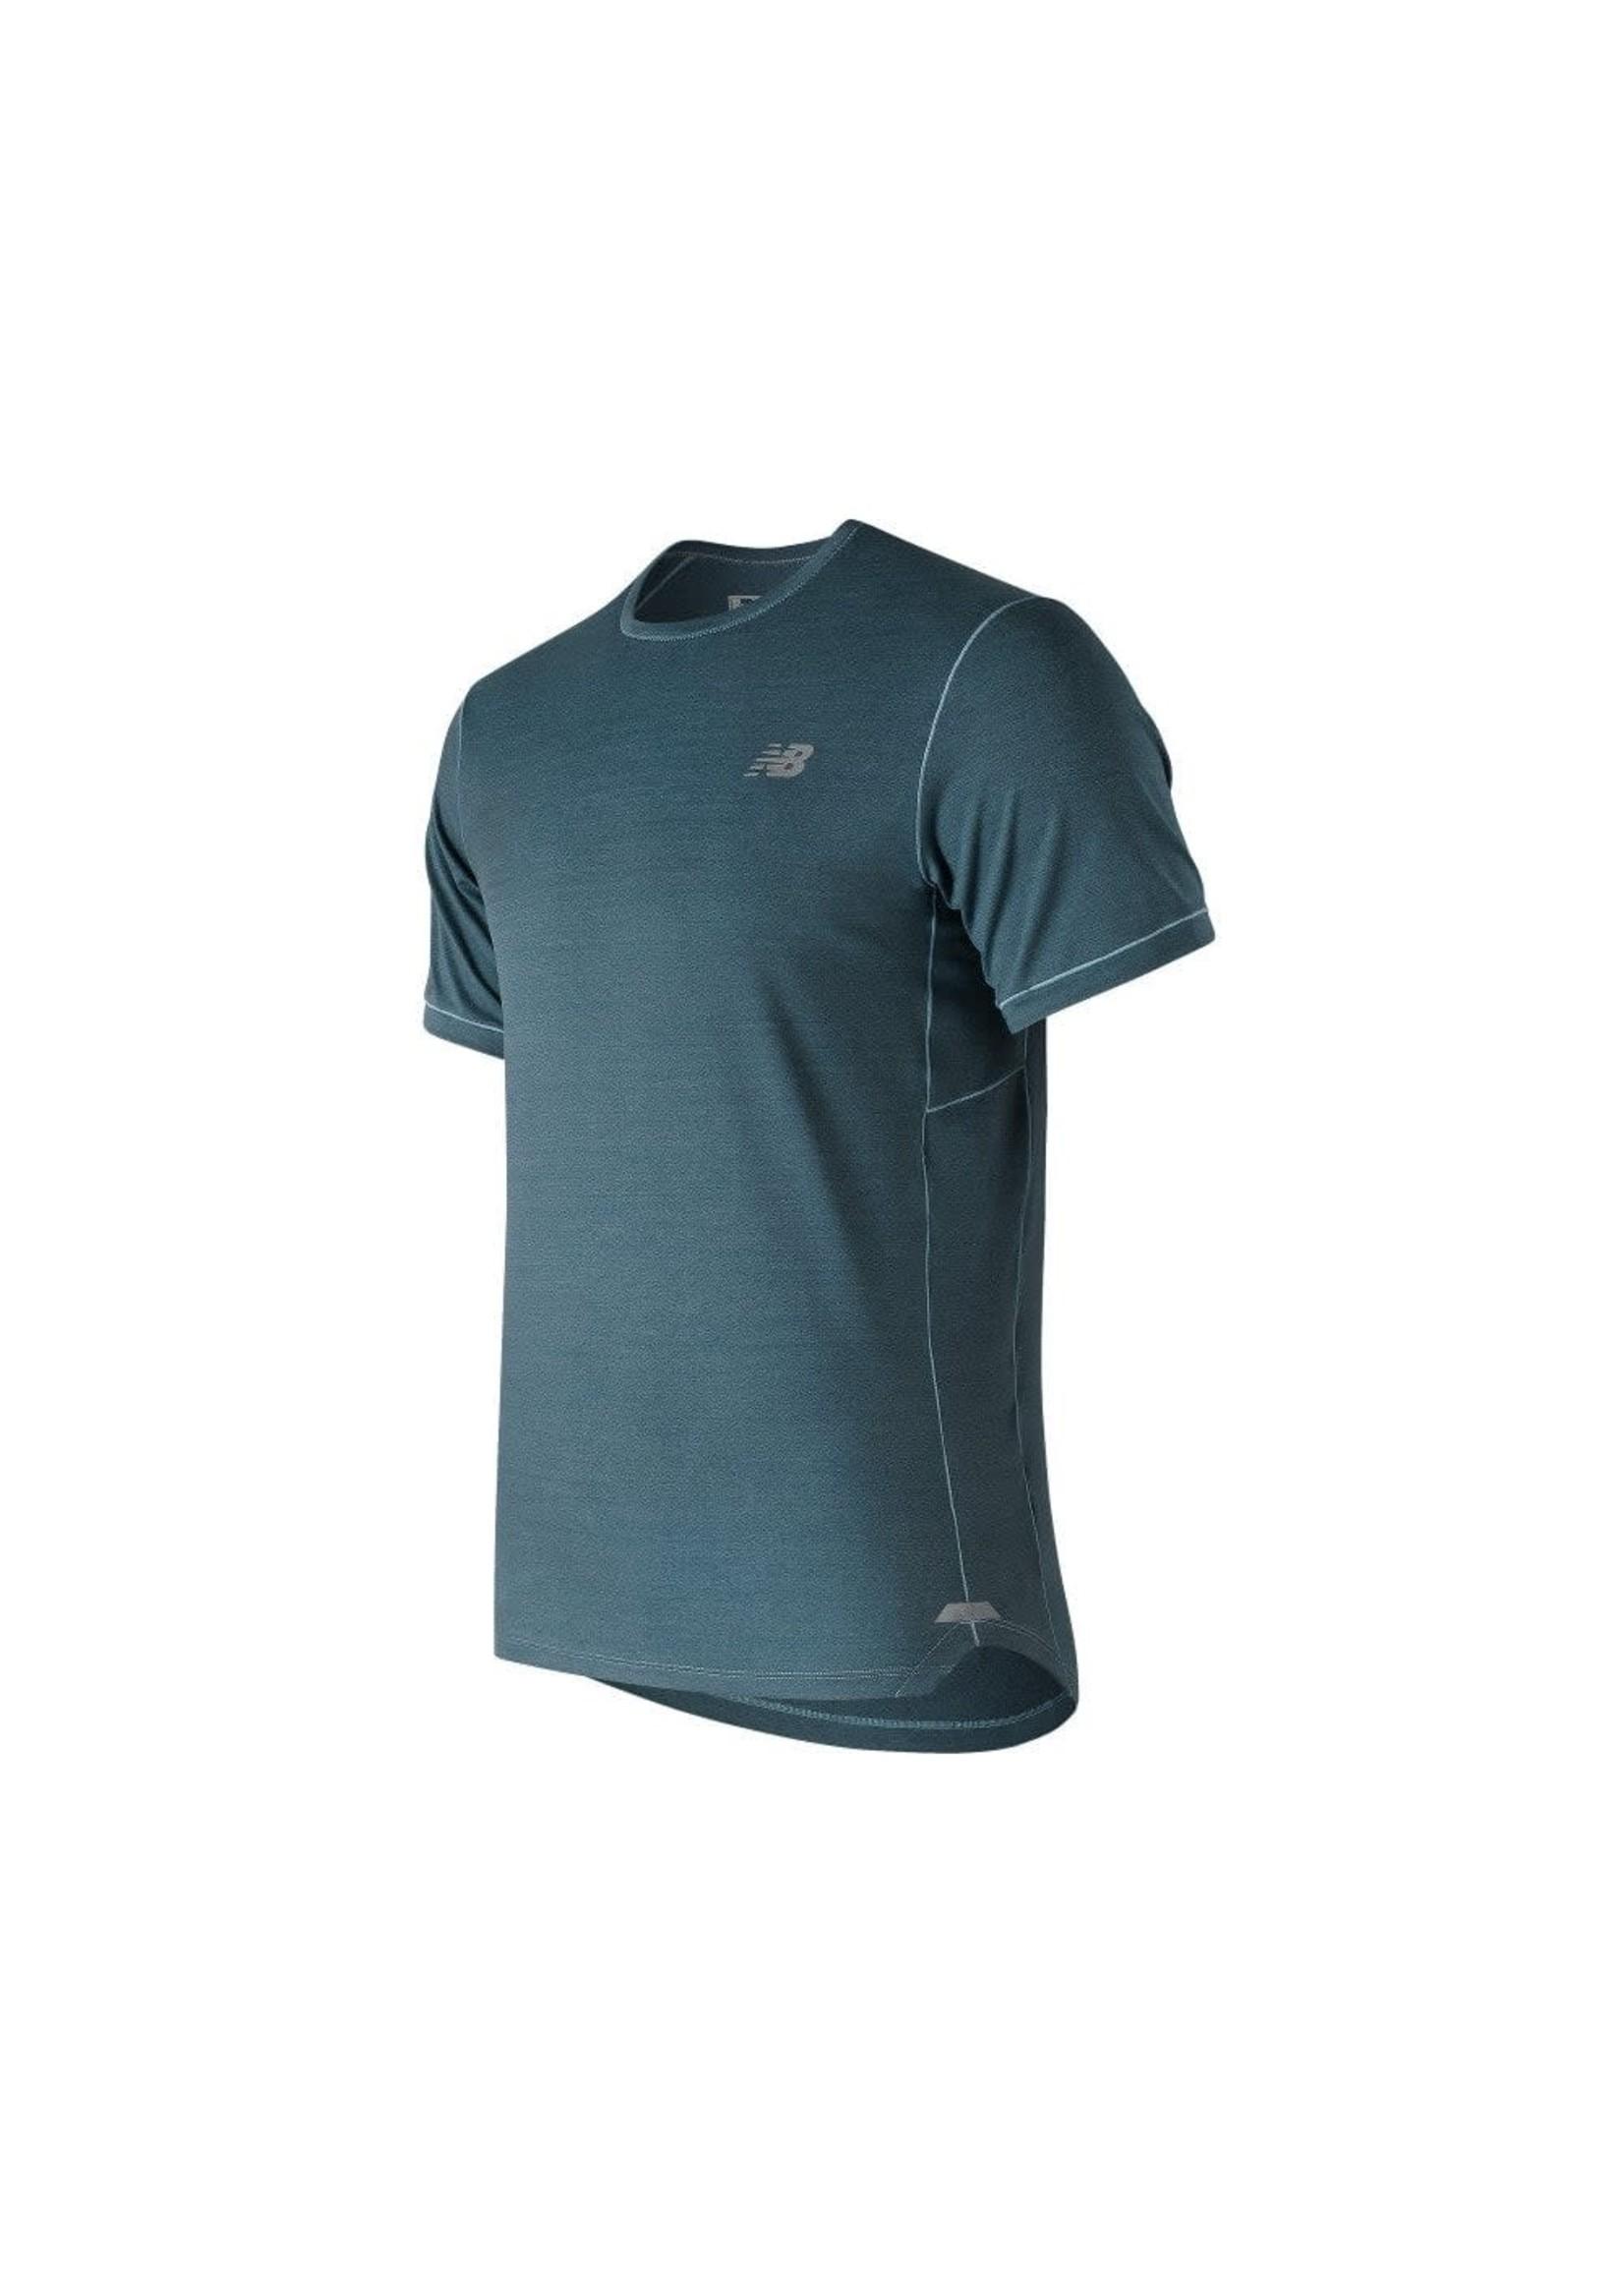 new balance New Balance Mens Seasonless Short Sleeve T-Shirt Blue XL